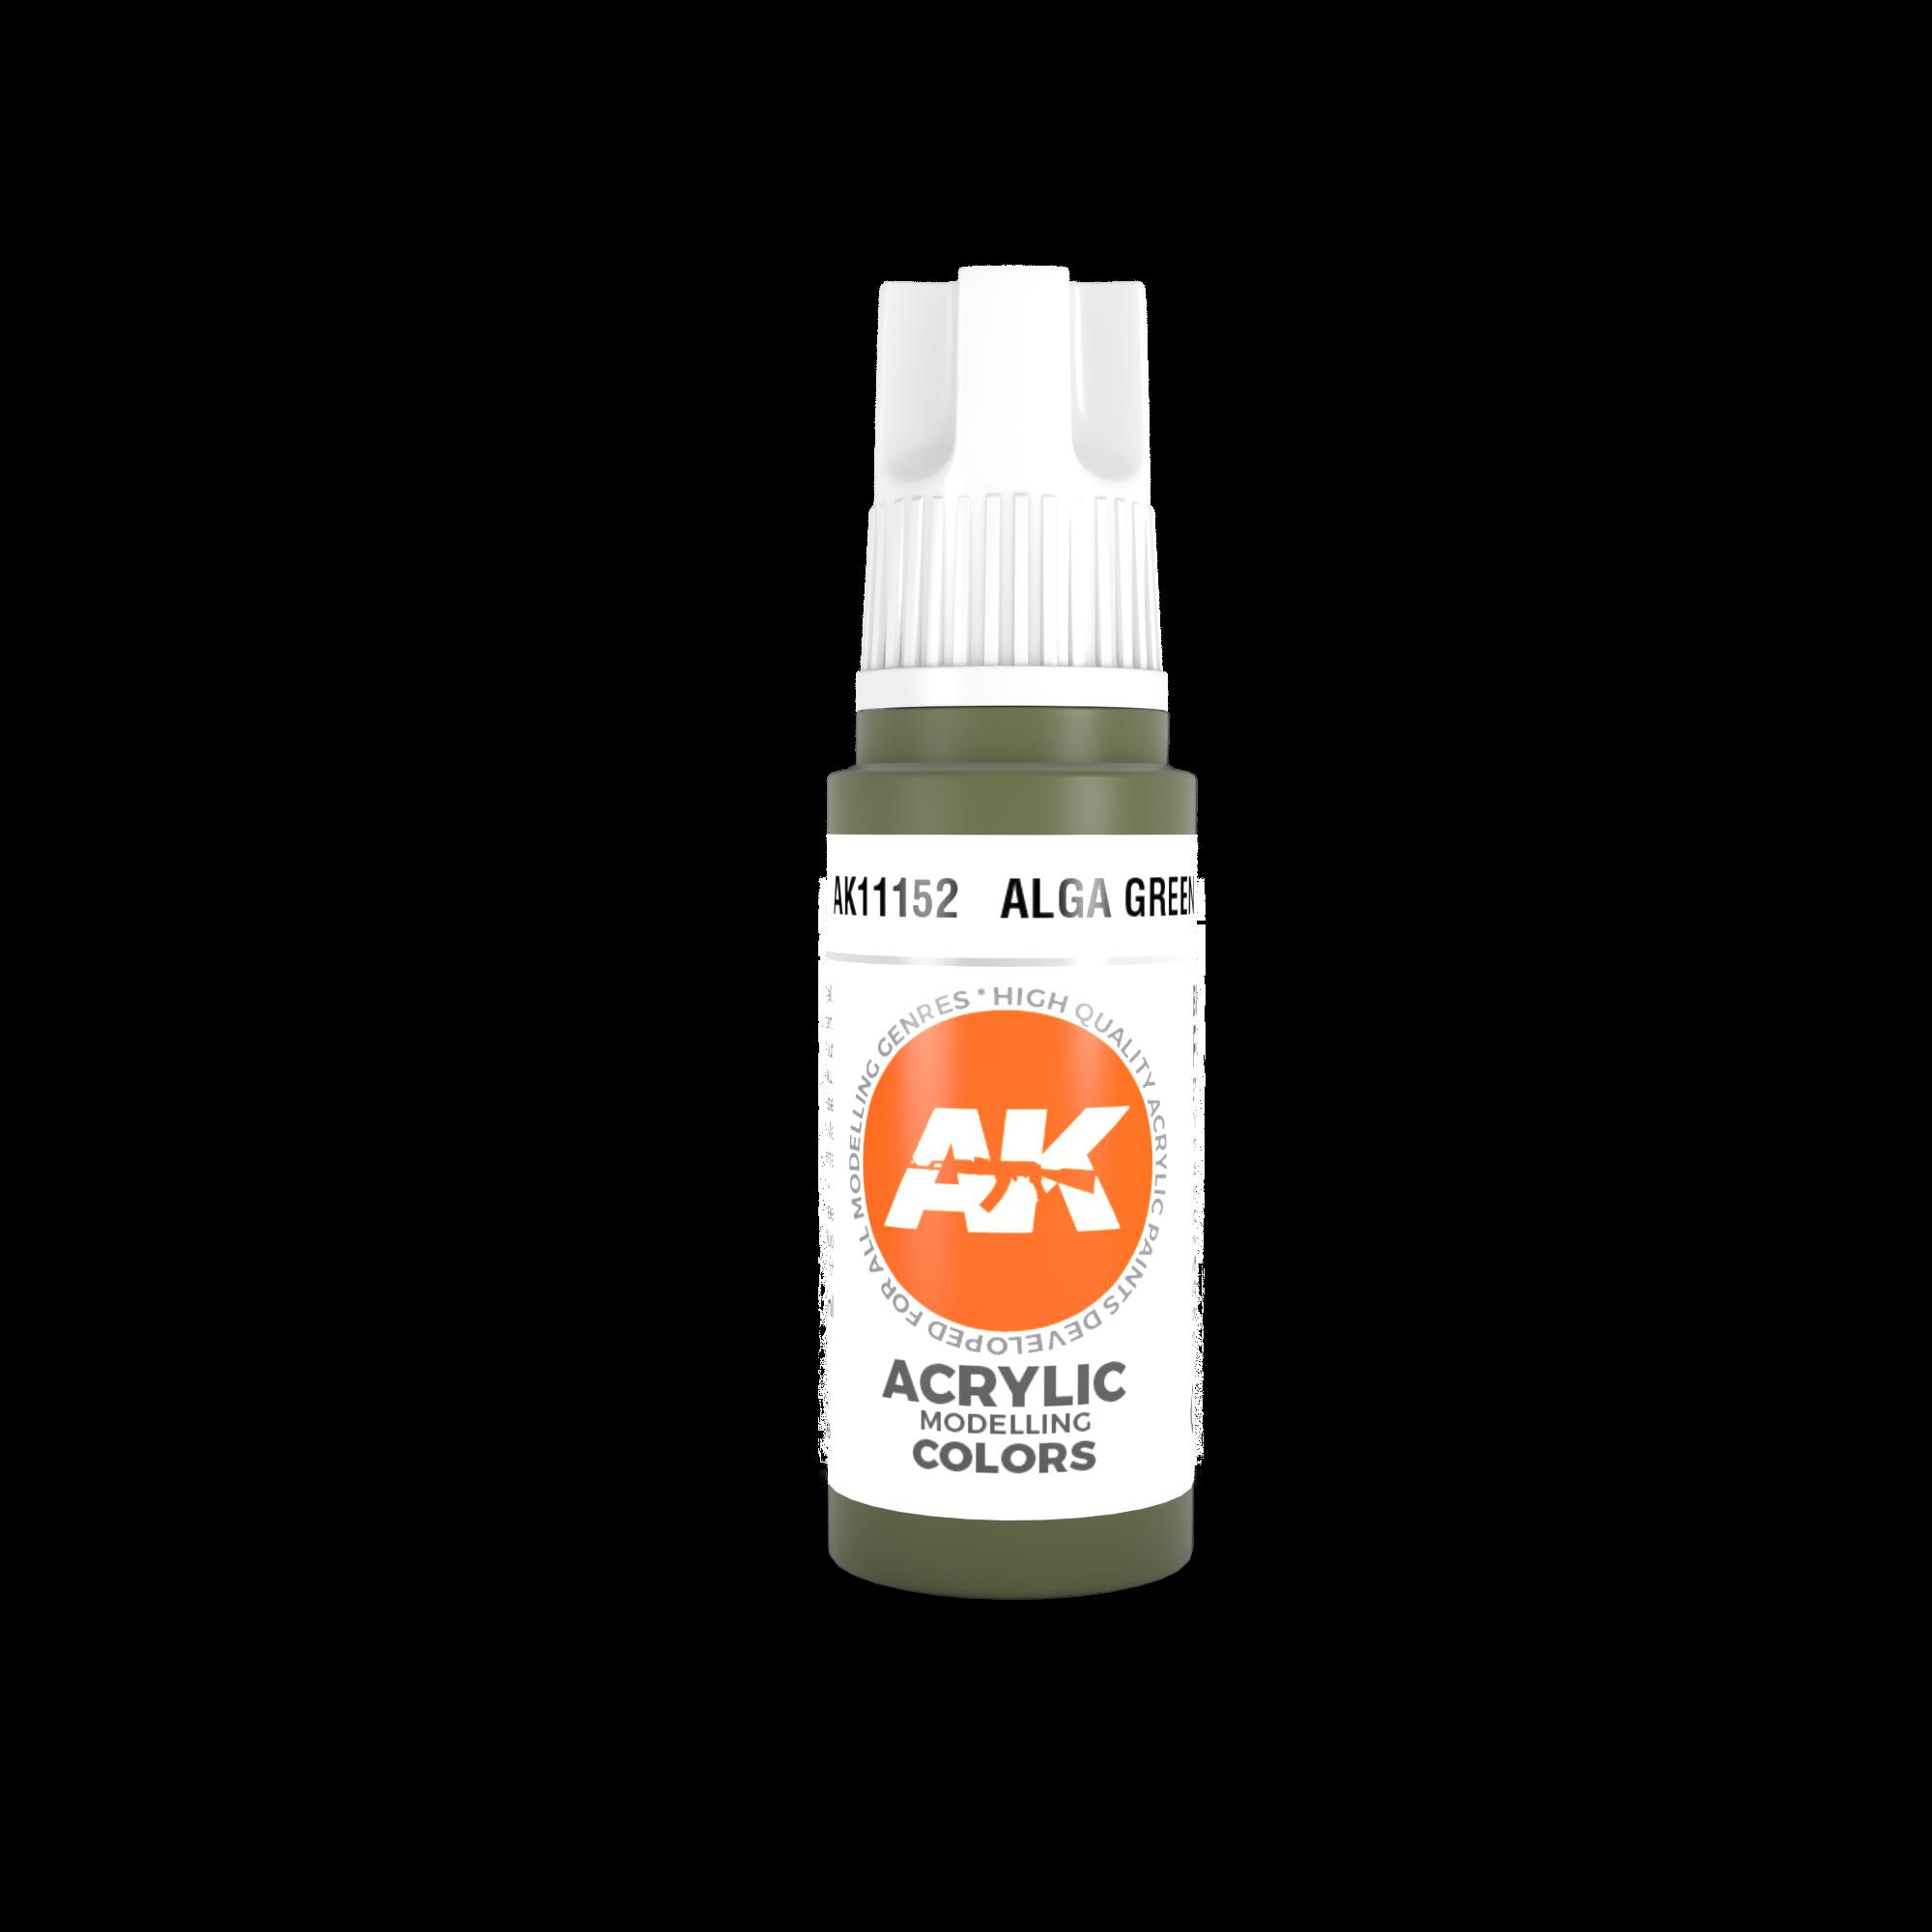 AK-Interactive Alga Green Acrylic Modelling Color - 17ml - AK-11152